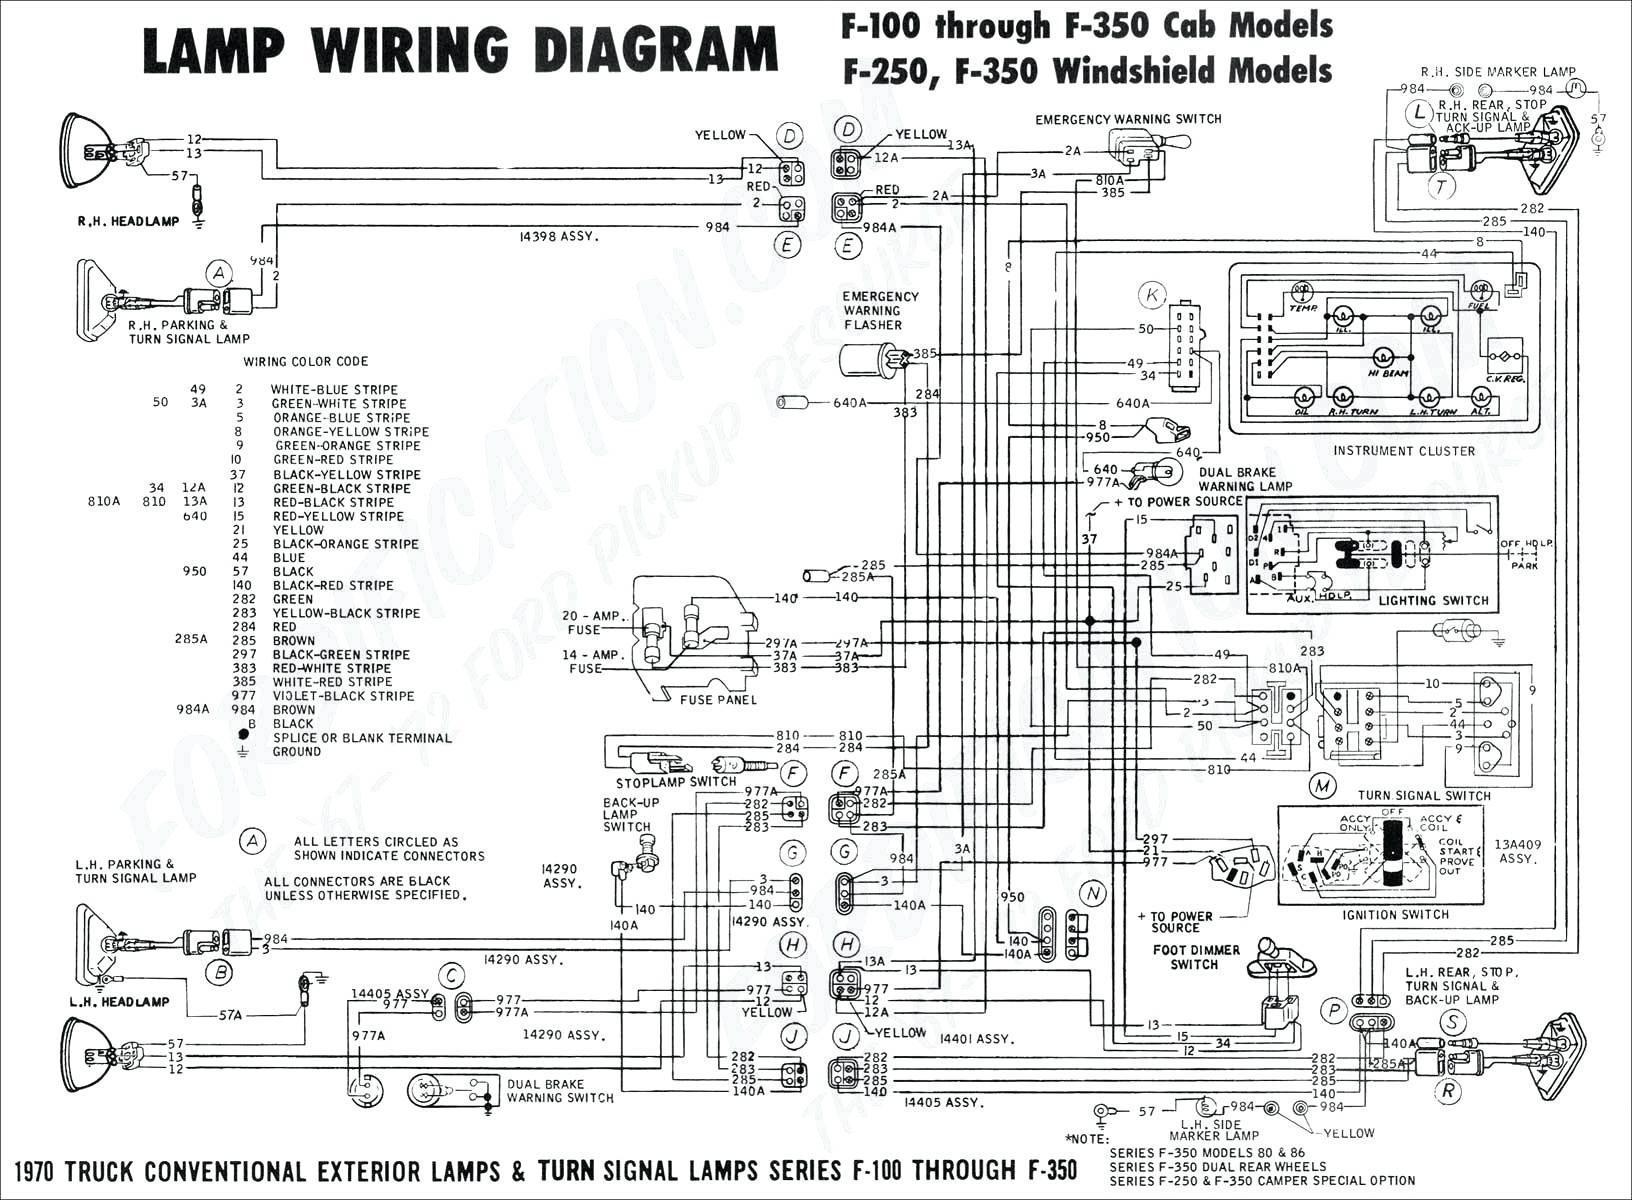 nissan quest wiring diagram wiring diagramo2 sensor wiring diagram 2000 nissan quest wiring library